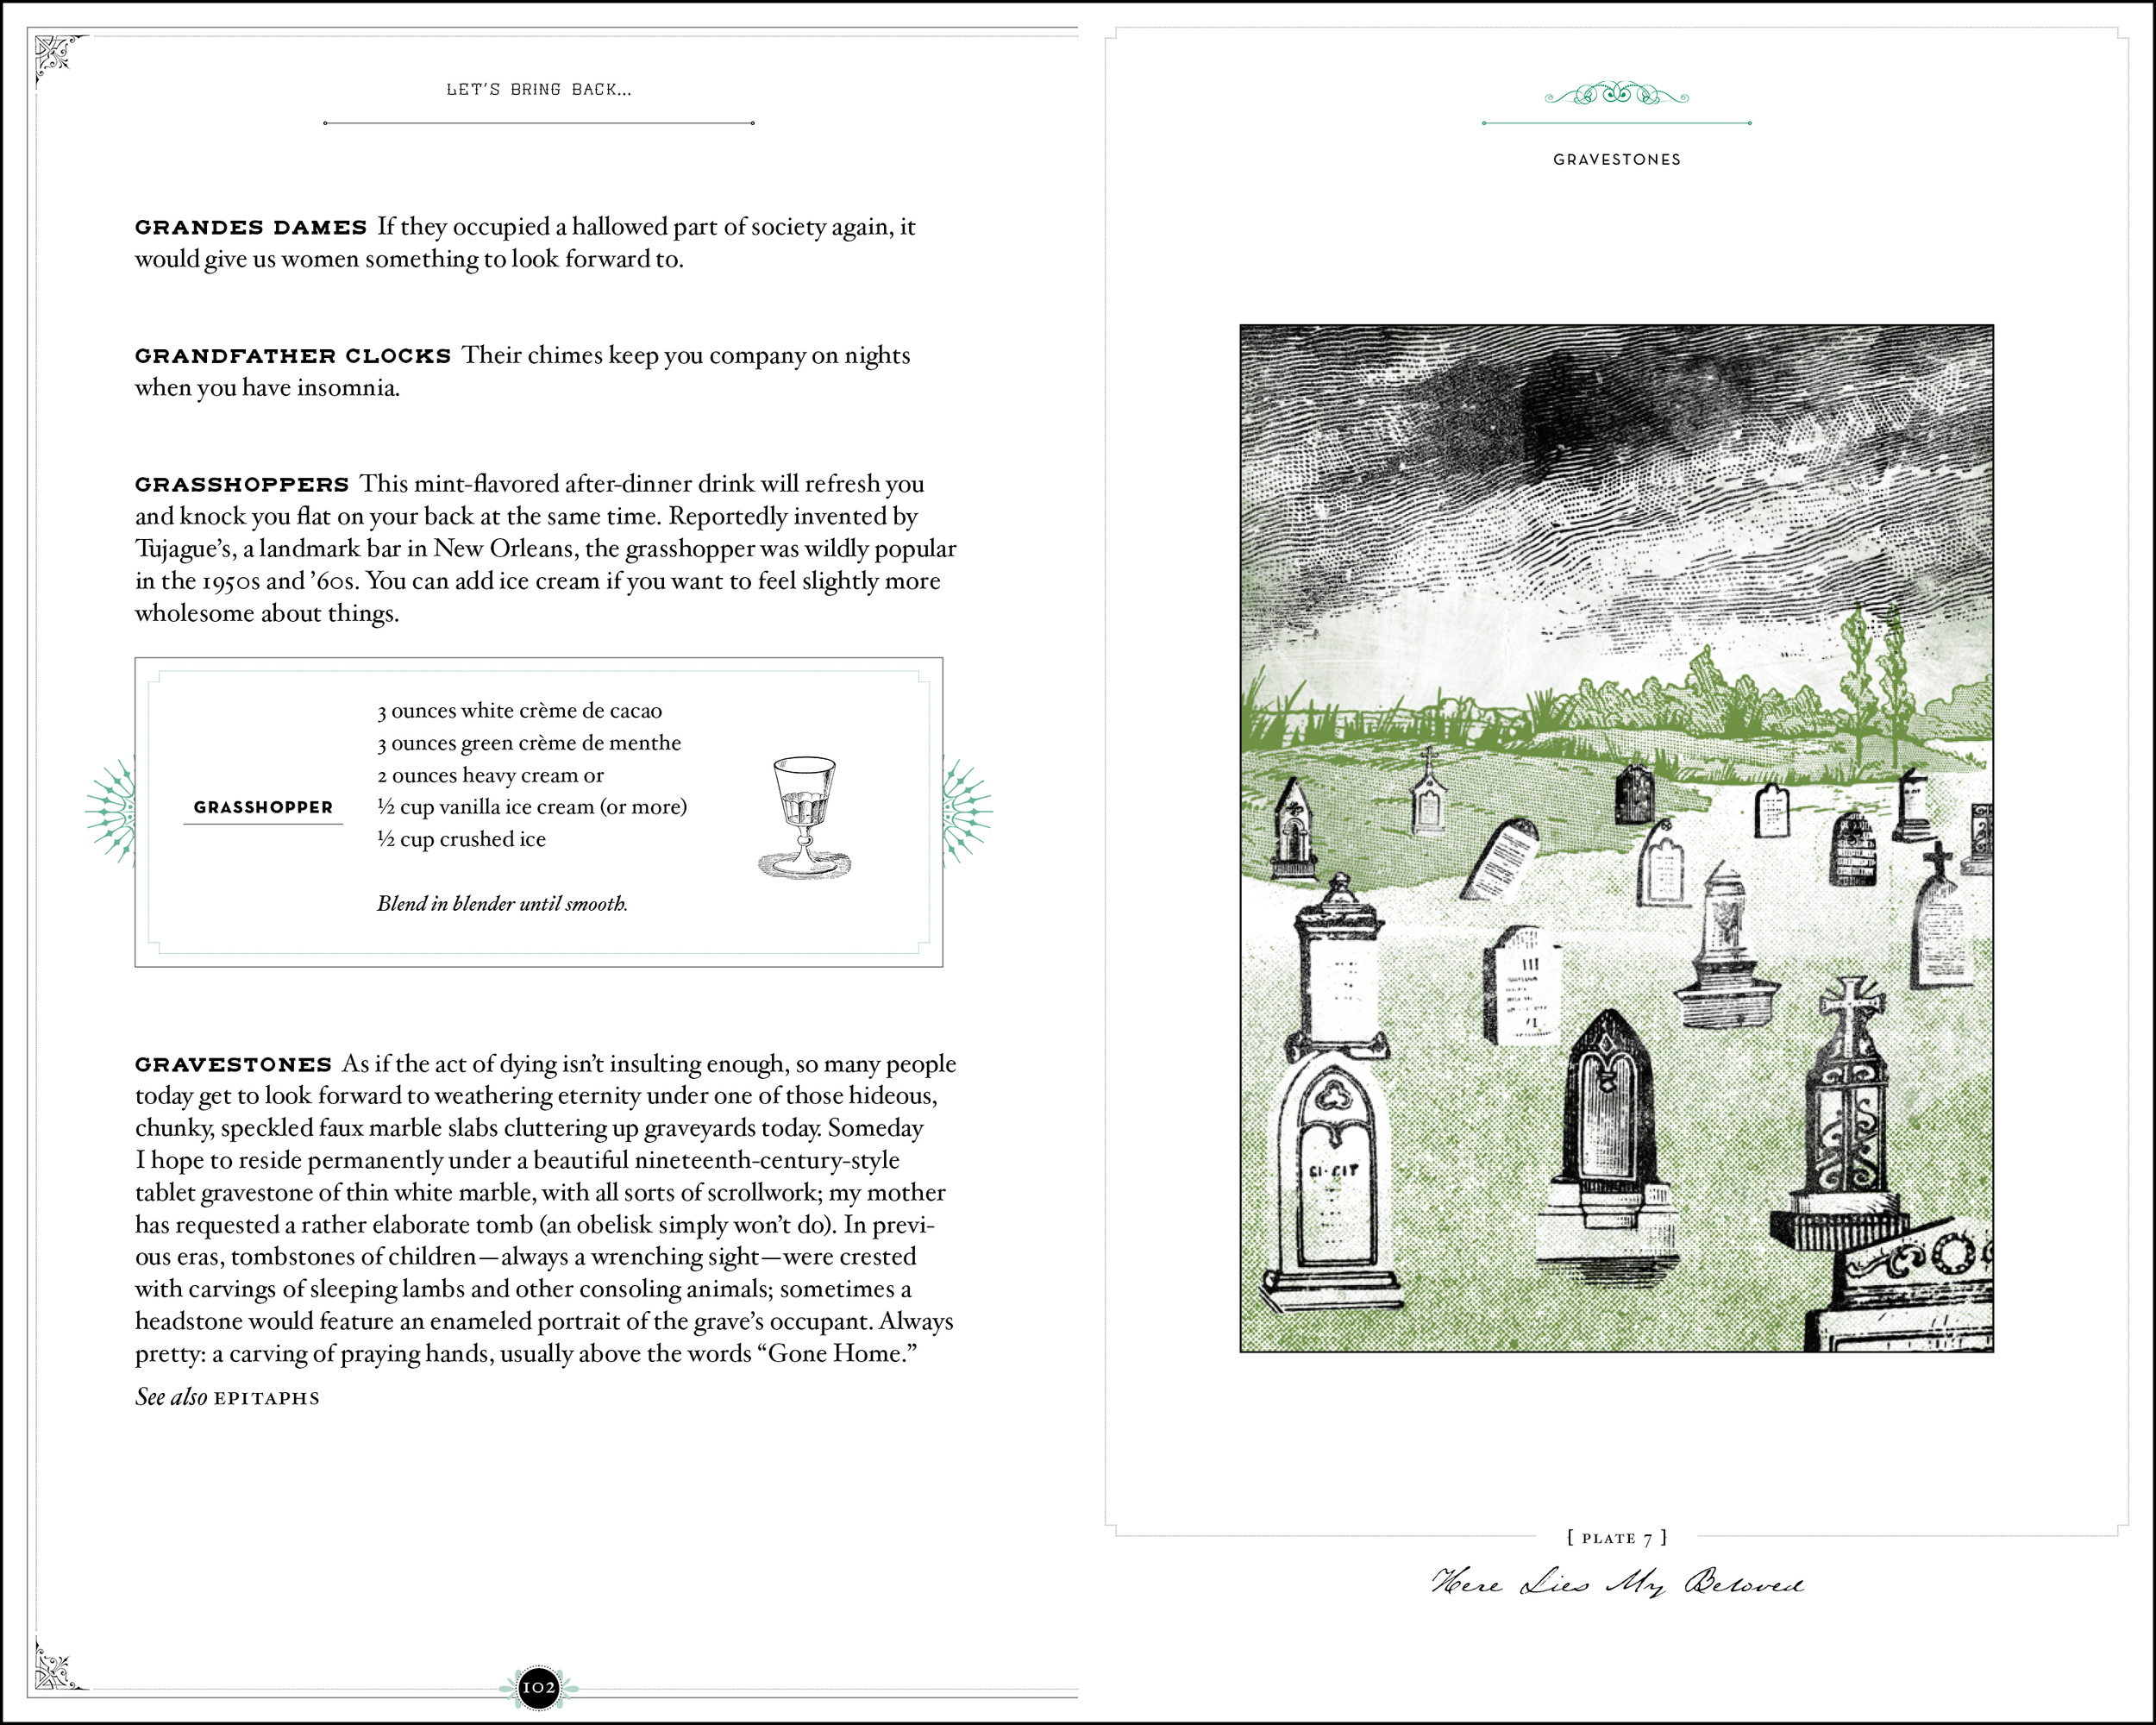 LBB1_gravestones-2.jpg